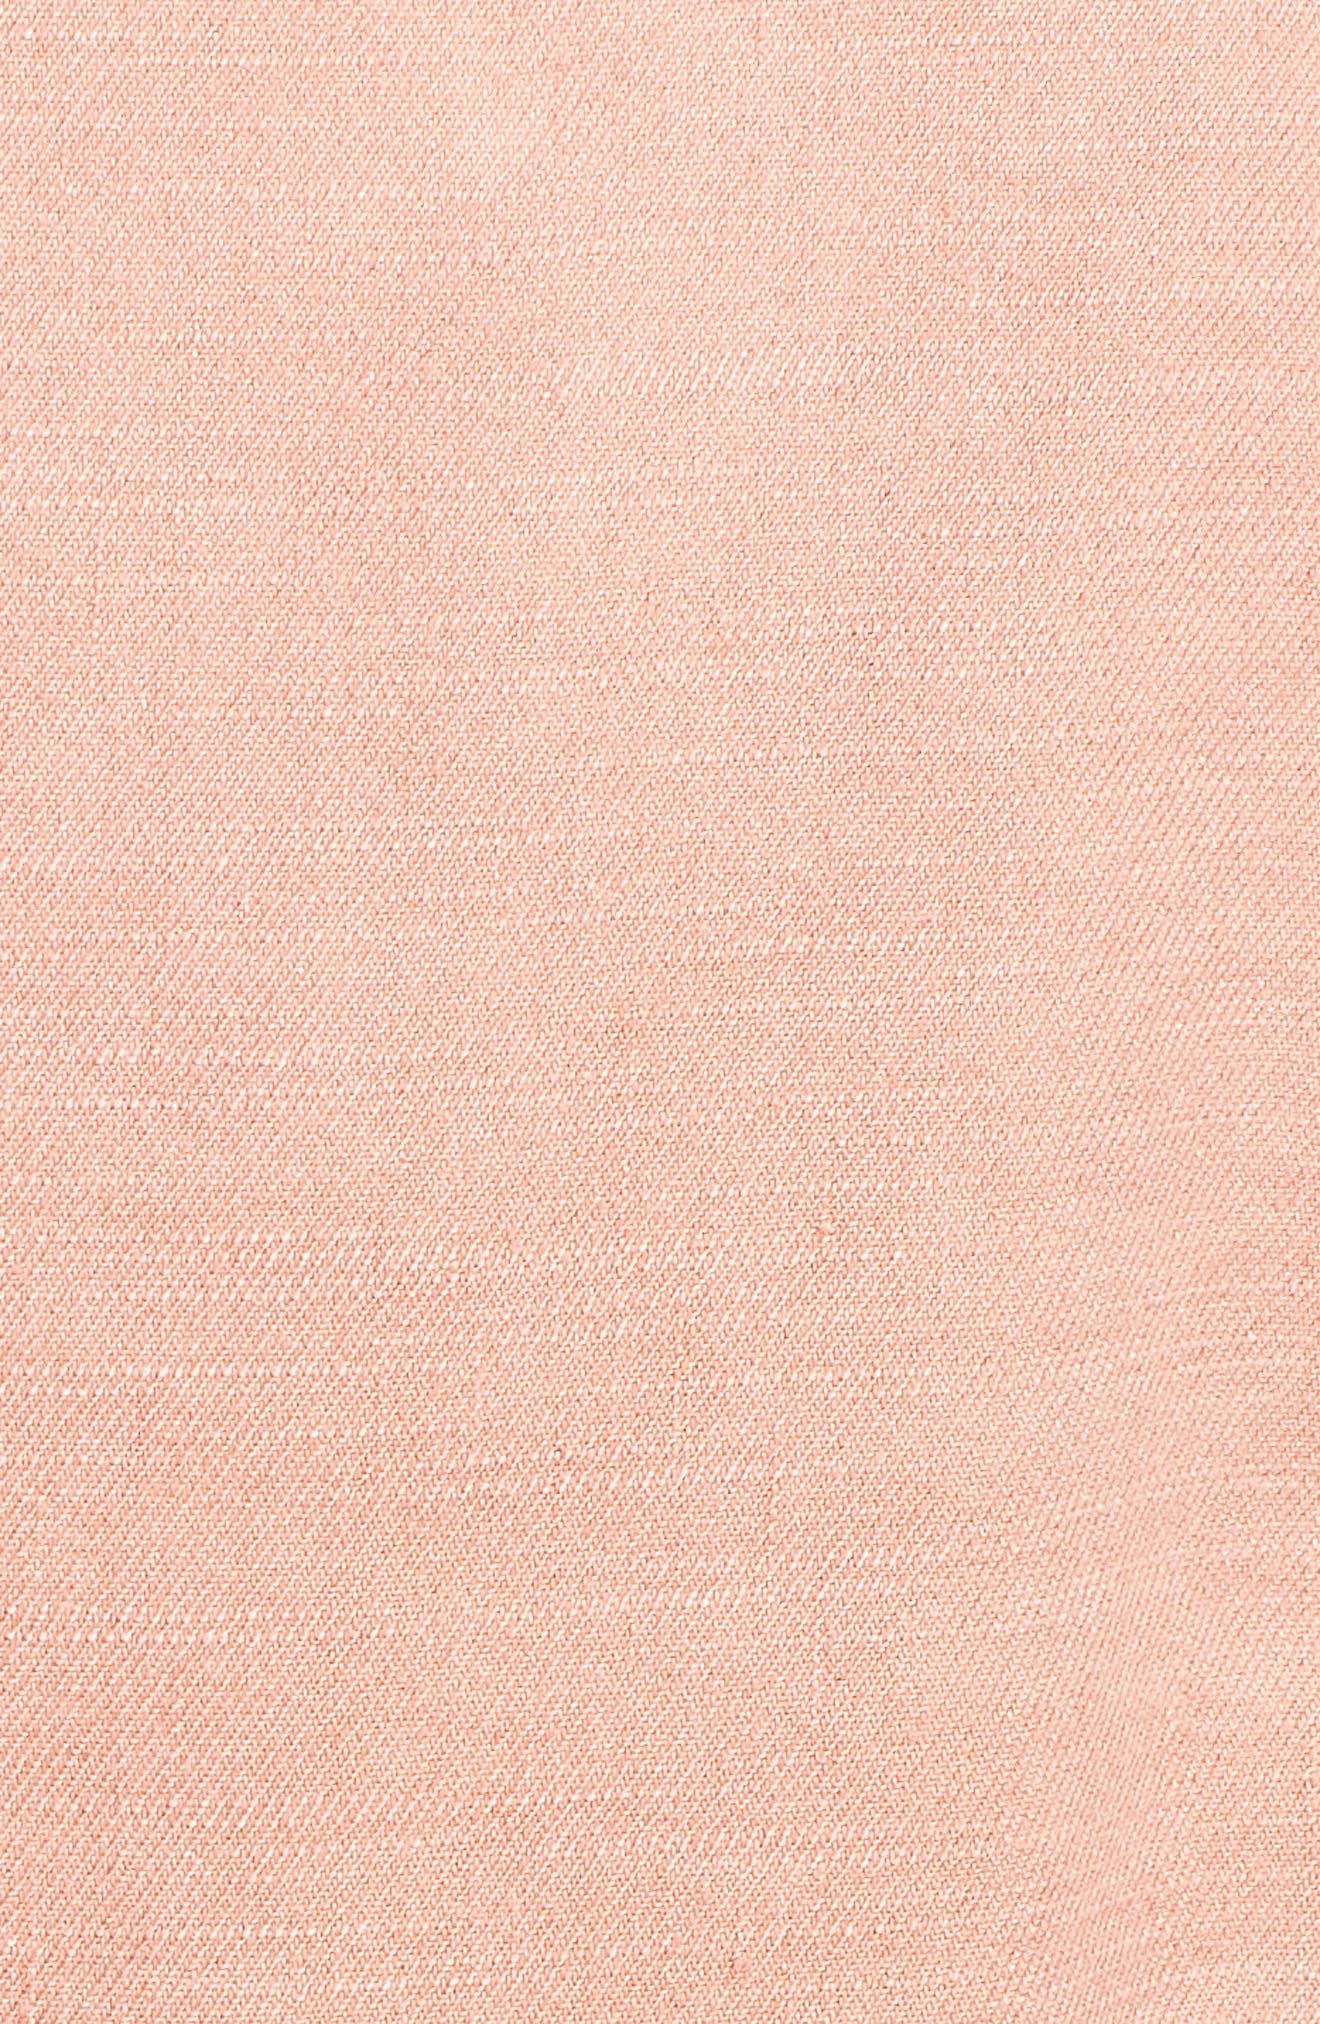 Linen Blend Drape Jacket,                             Alternate thumbnail 12, color,